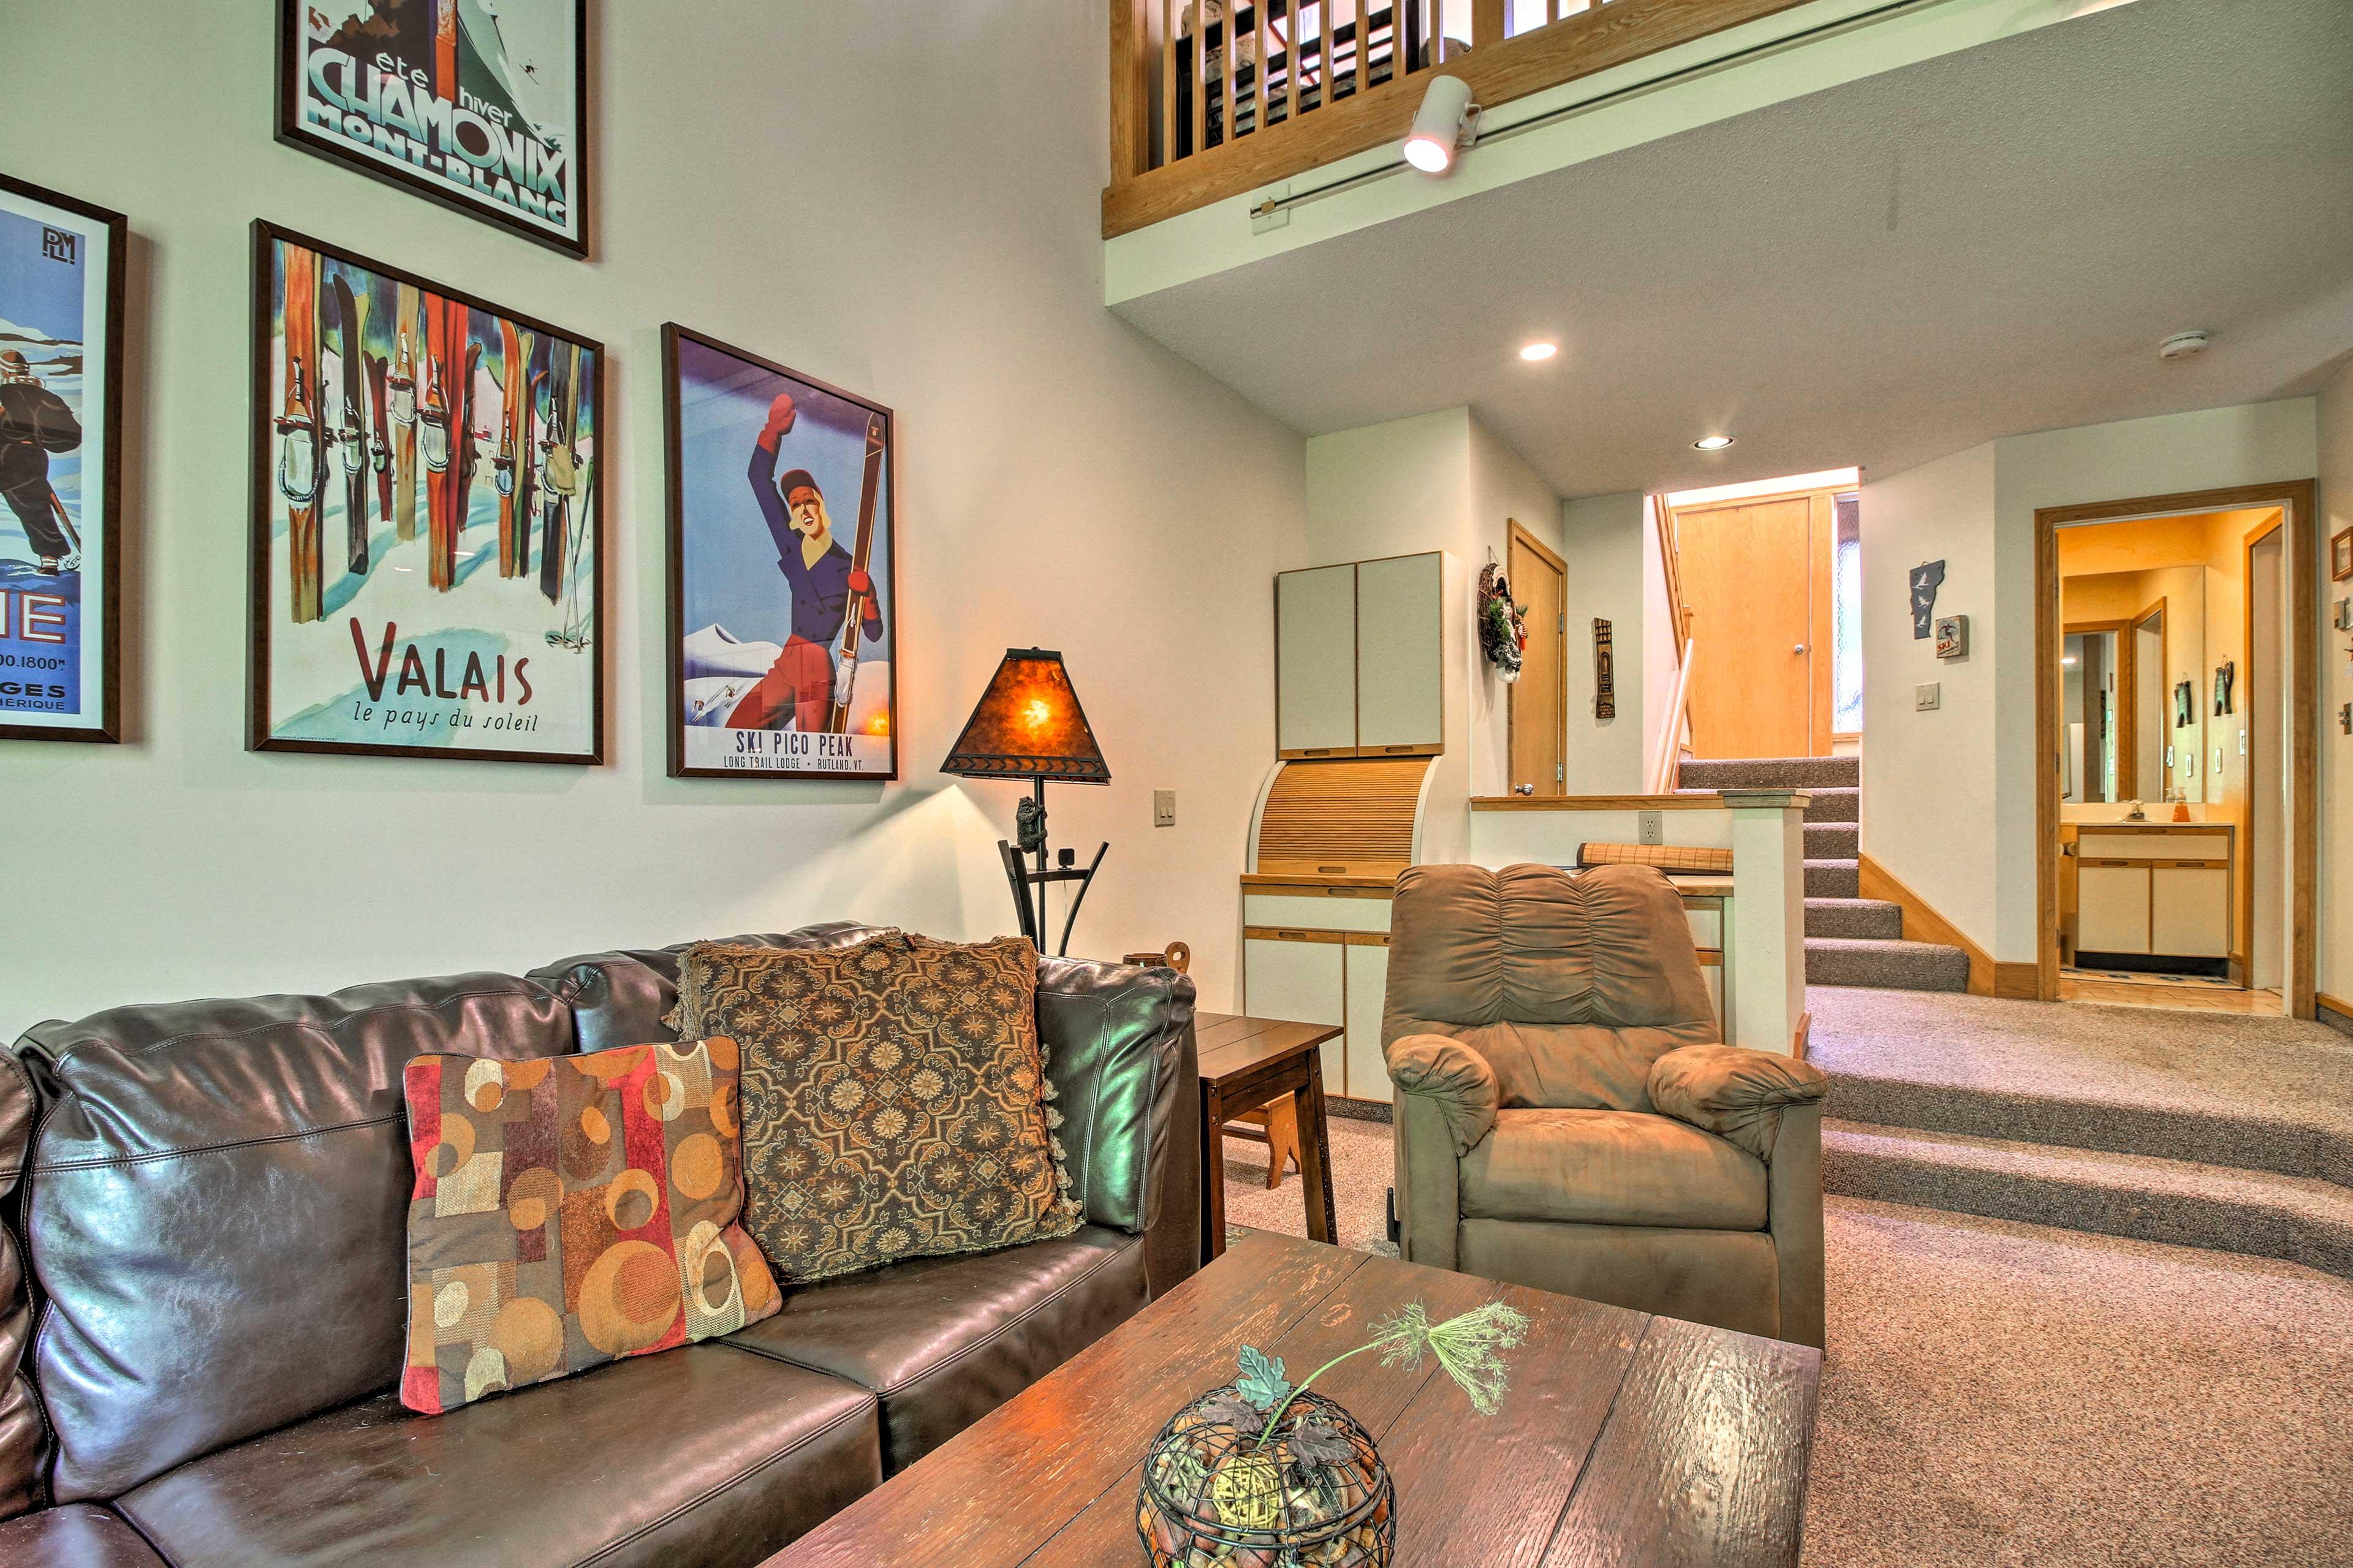 Killington Vacation Rental Condo | 2BR | 2BA | 1,500 Sq Ft | 2 Stories